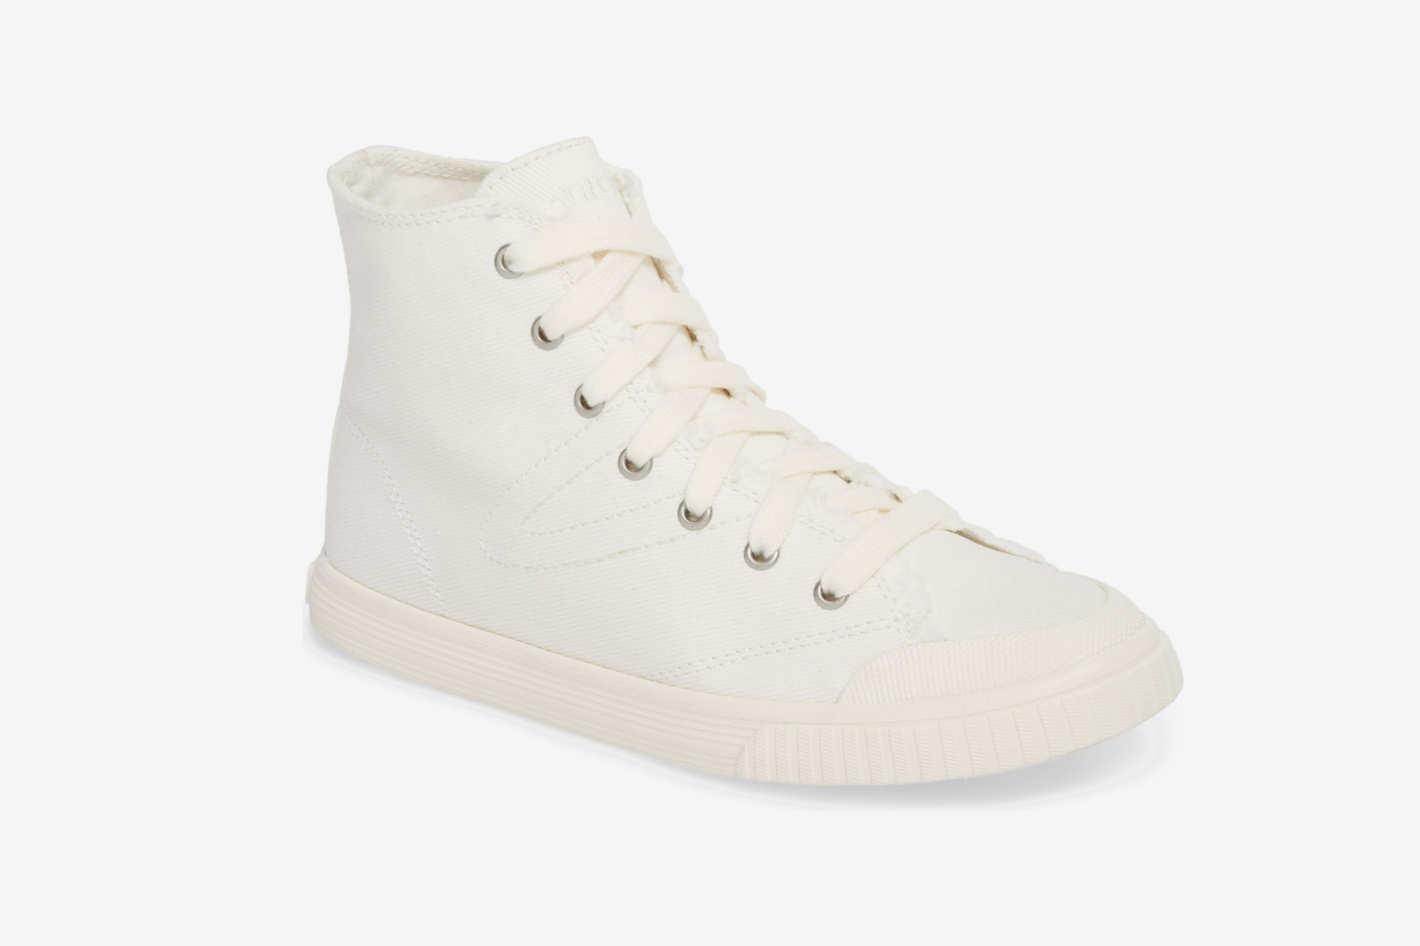 Tretorn Marley 2 High Top Sneaker